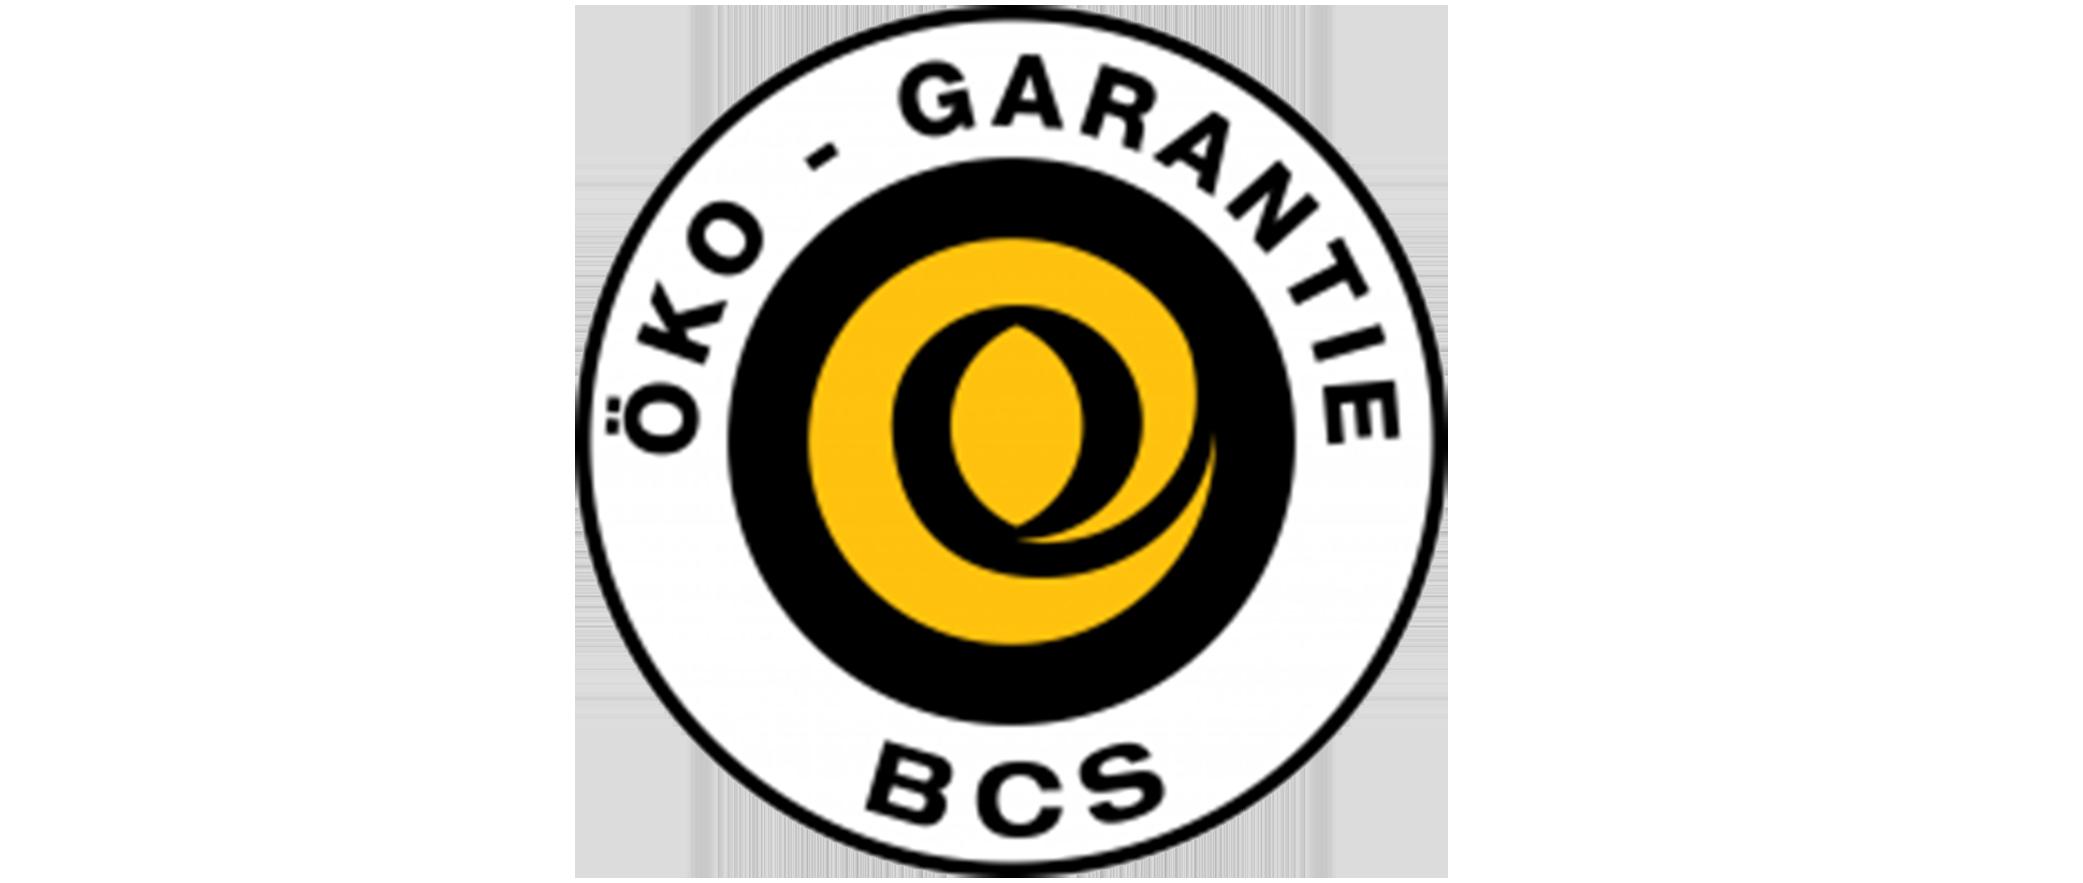 Oko Garanyie BCS